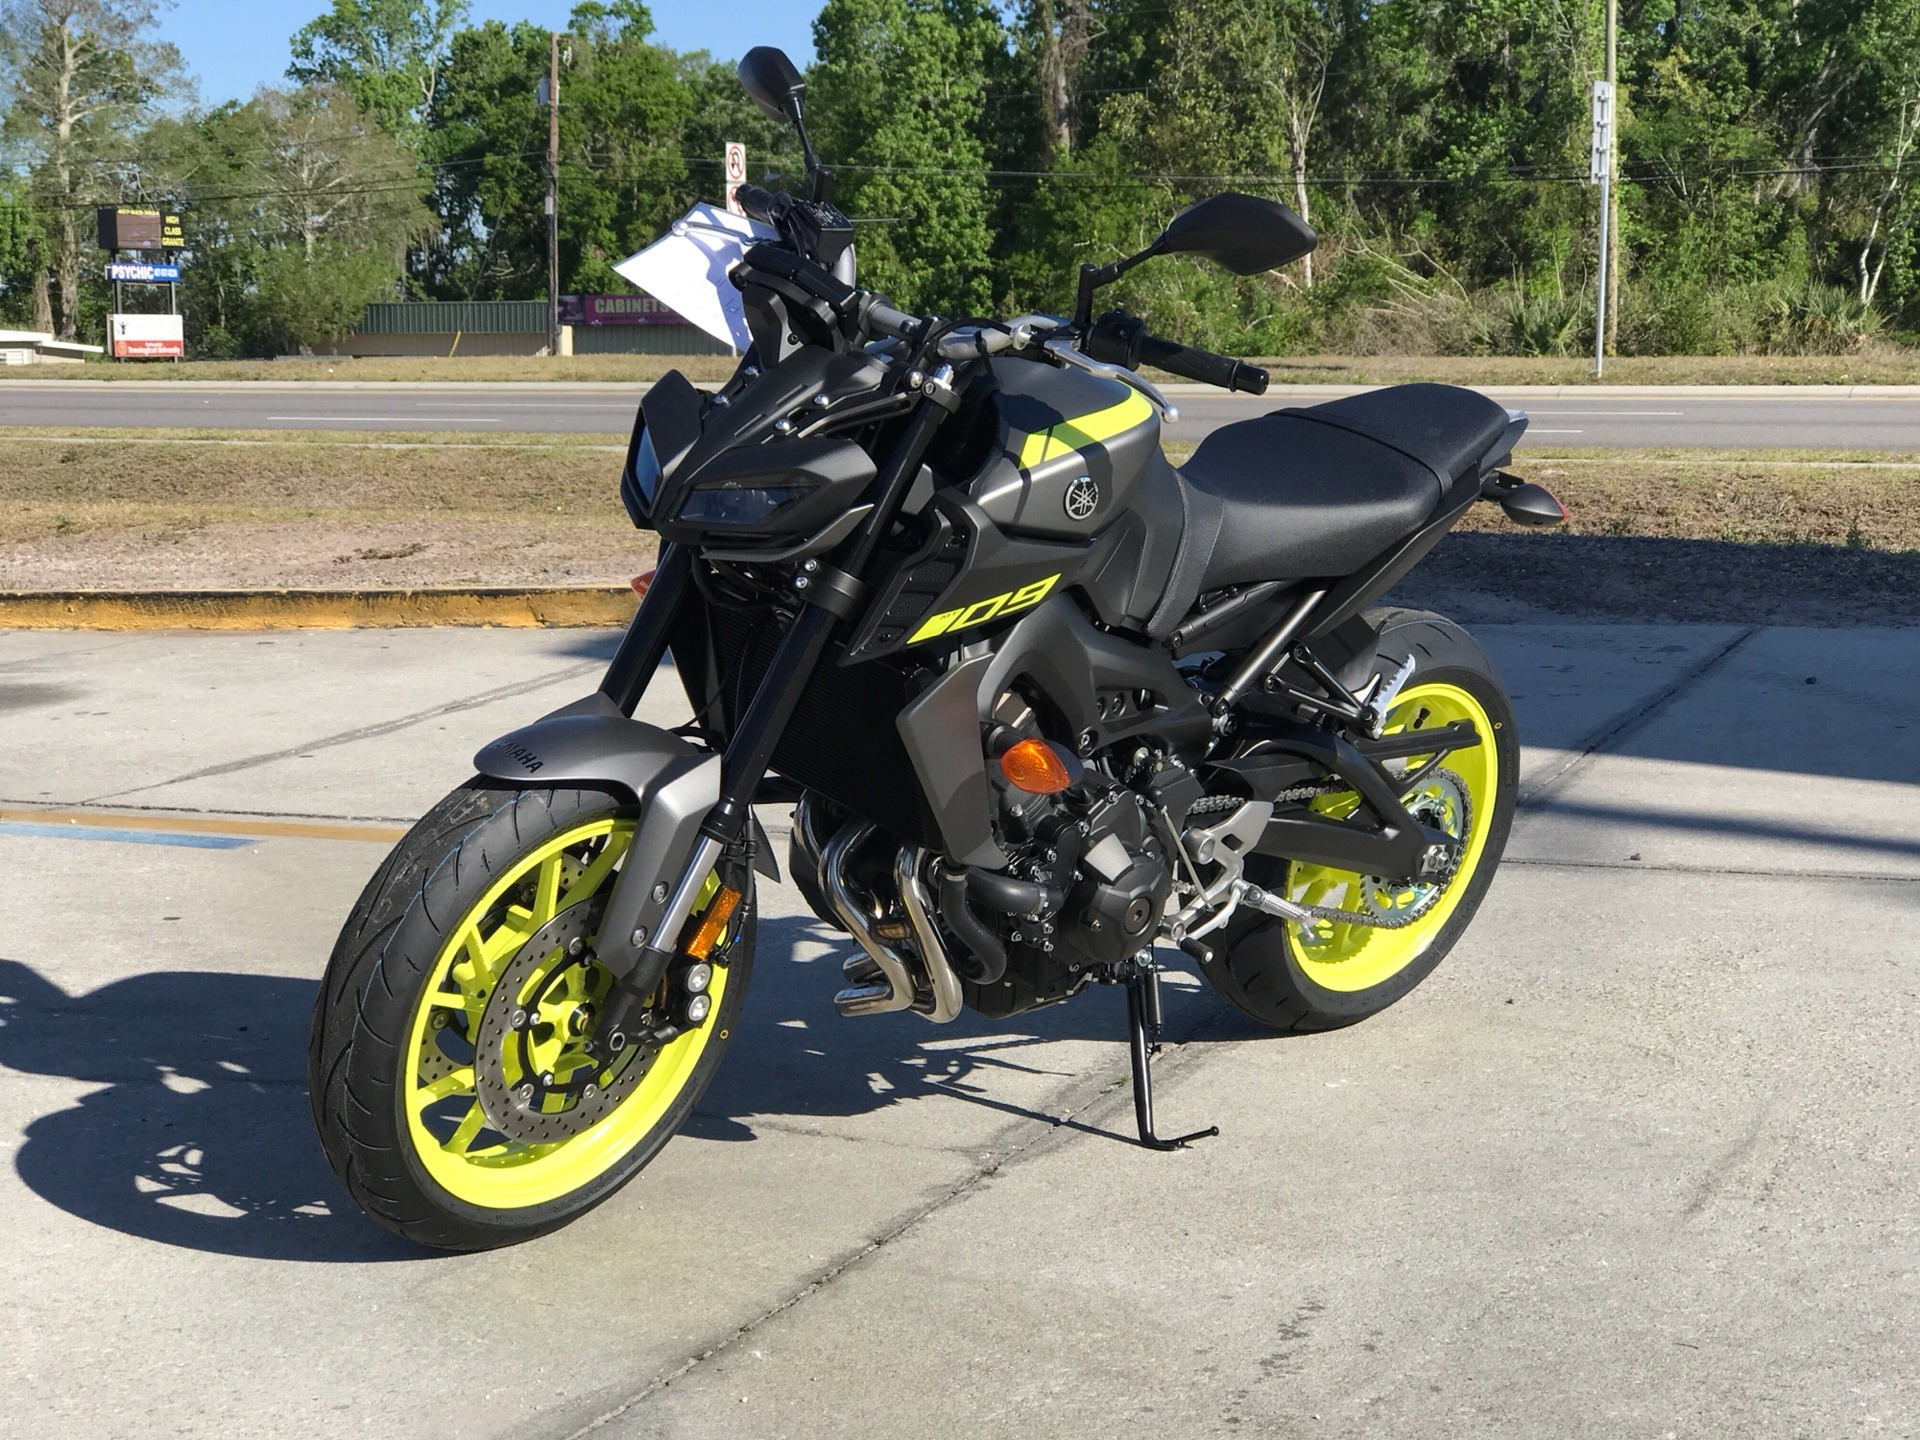 yamaha mt 09  2018 Yamaha MT-09 Motorcycles Orlando Florida NEWMT